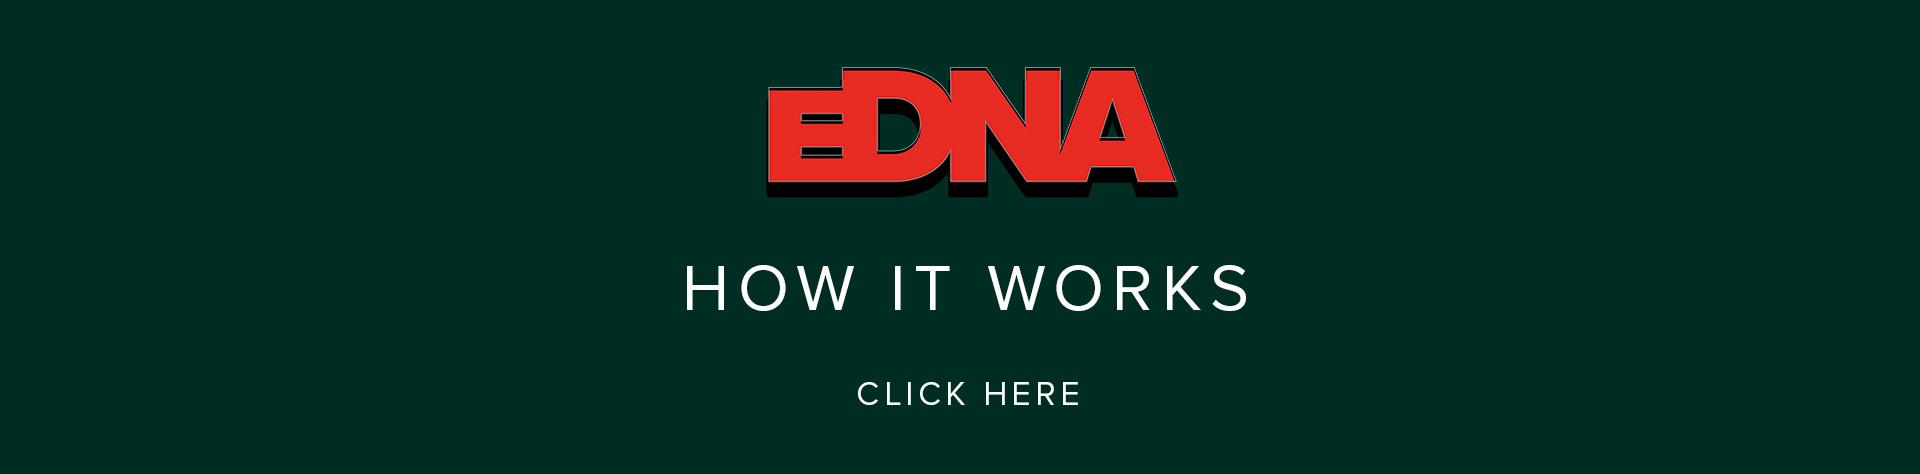 Spitfire Audio — EDNA Earth